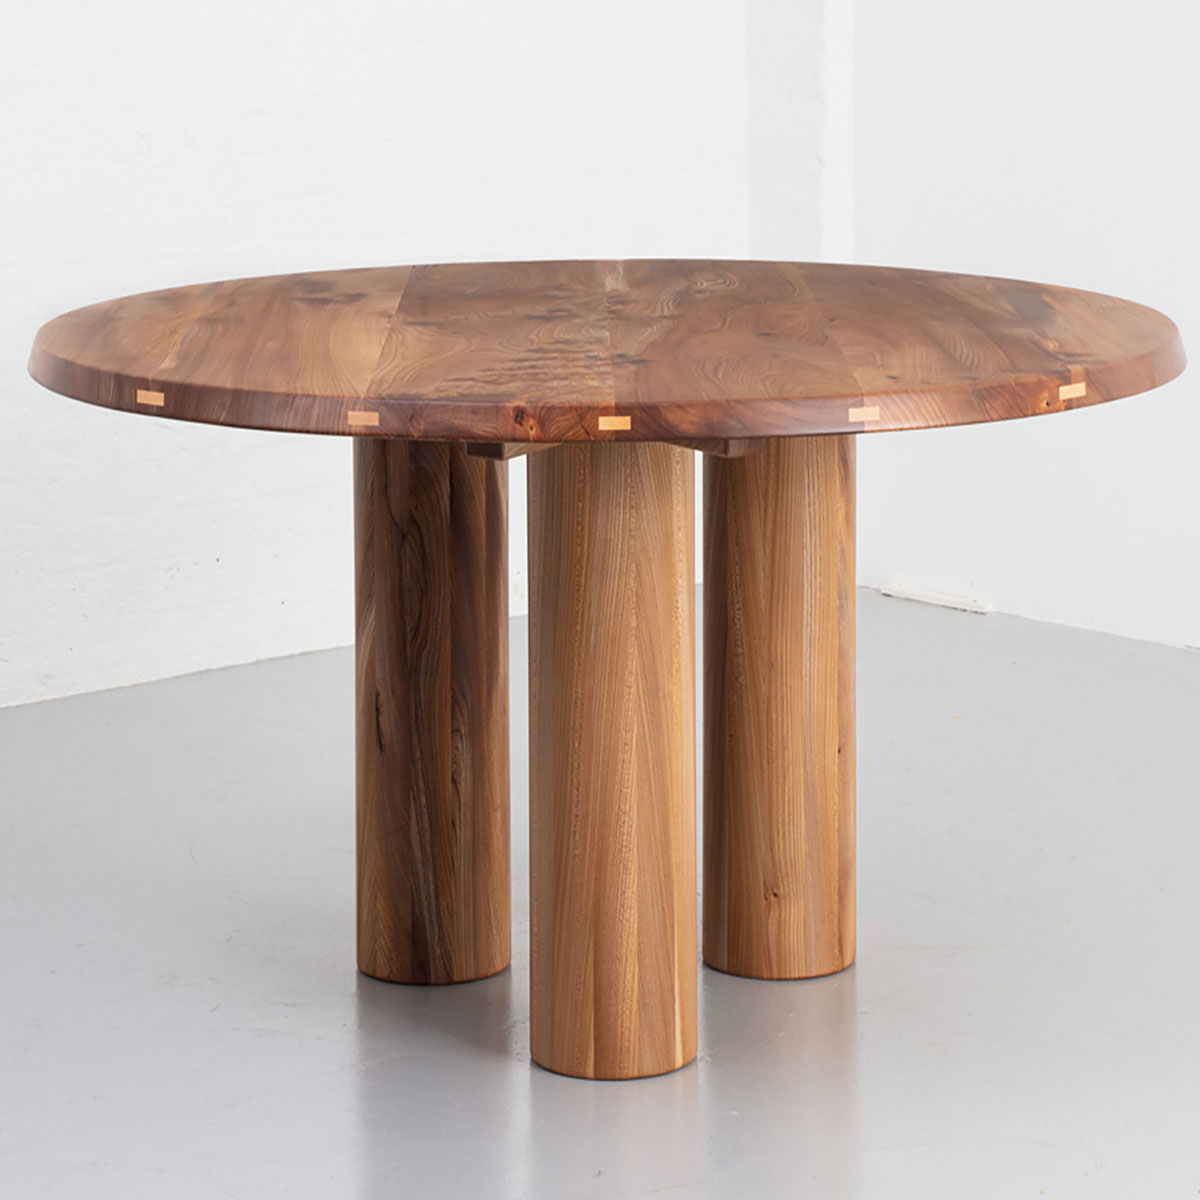 Jan Hendzel Round Tables Studio 2021-2(square)